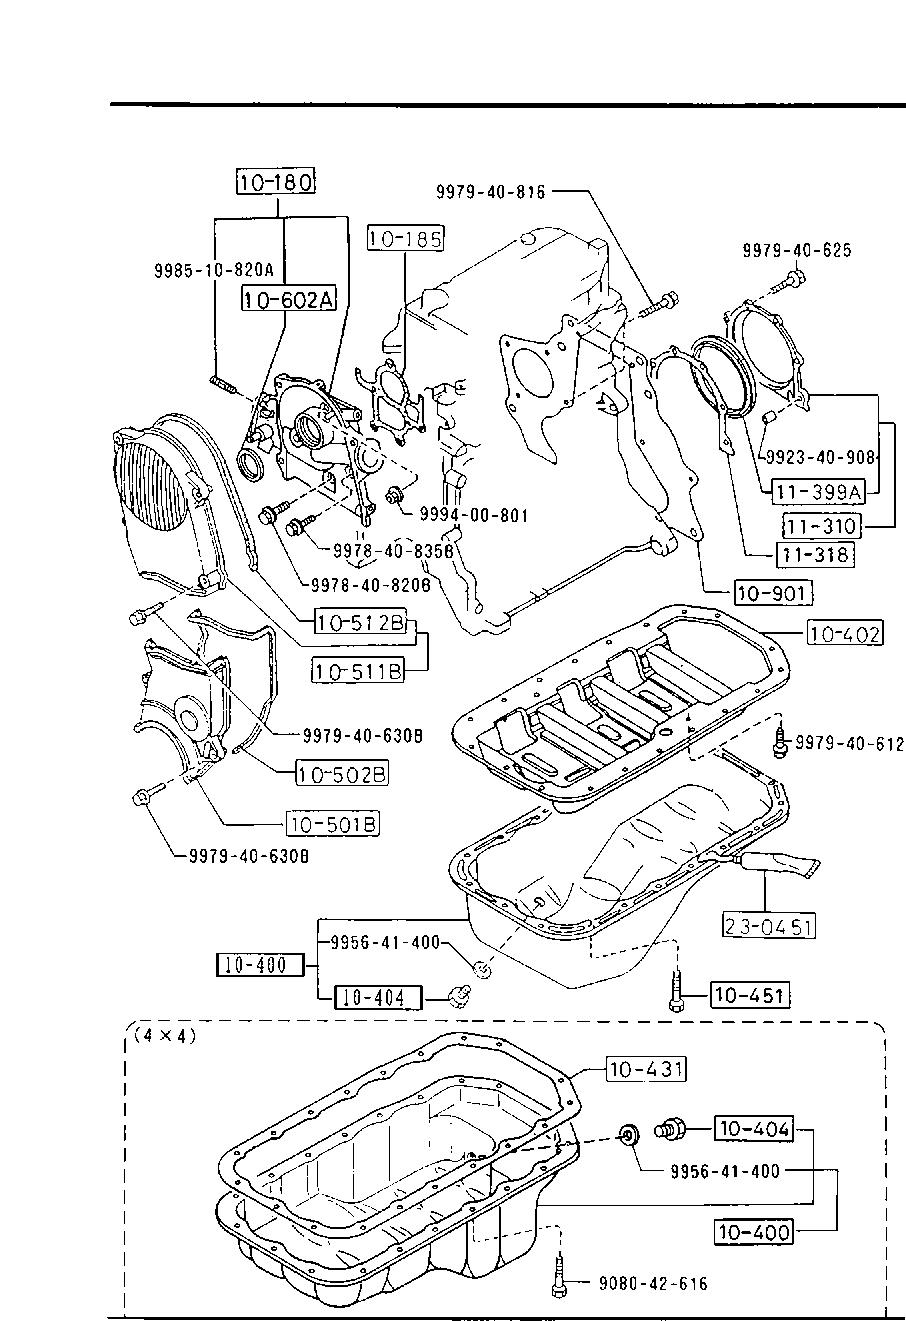 hight resolution of 87 mazda 4cyl engine diagram wiring diagrams posts 87 mazda 4cyl engine diagram